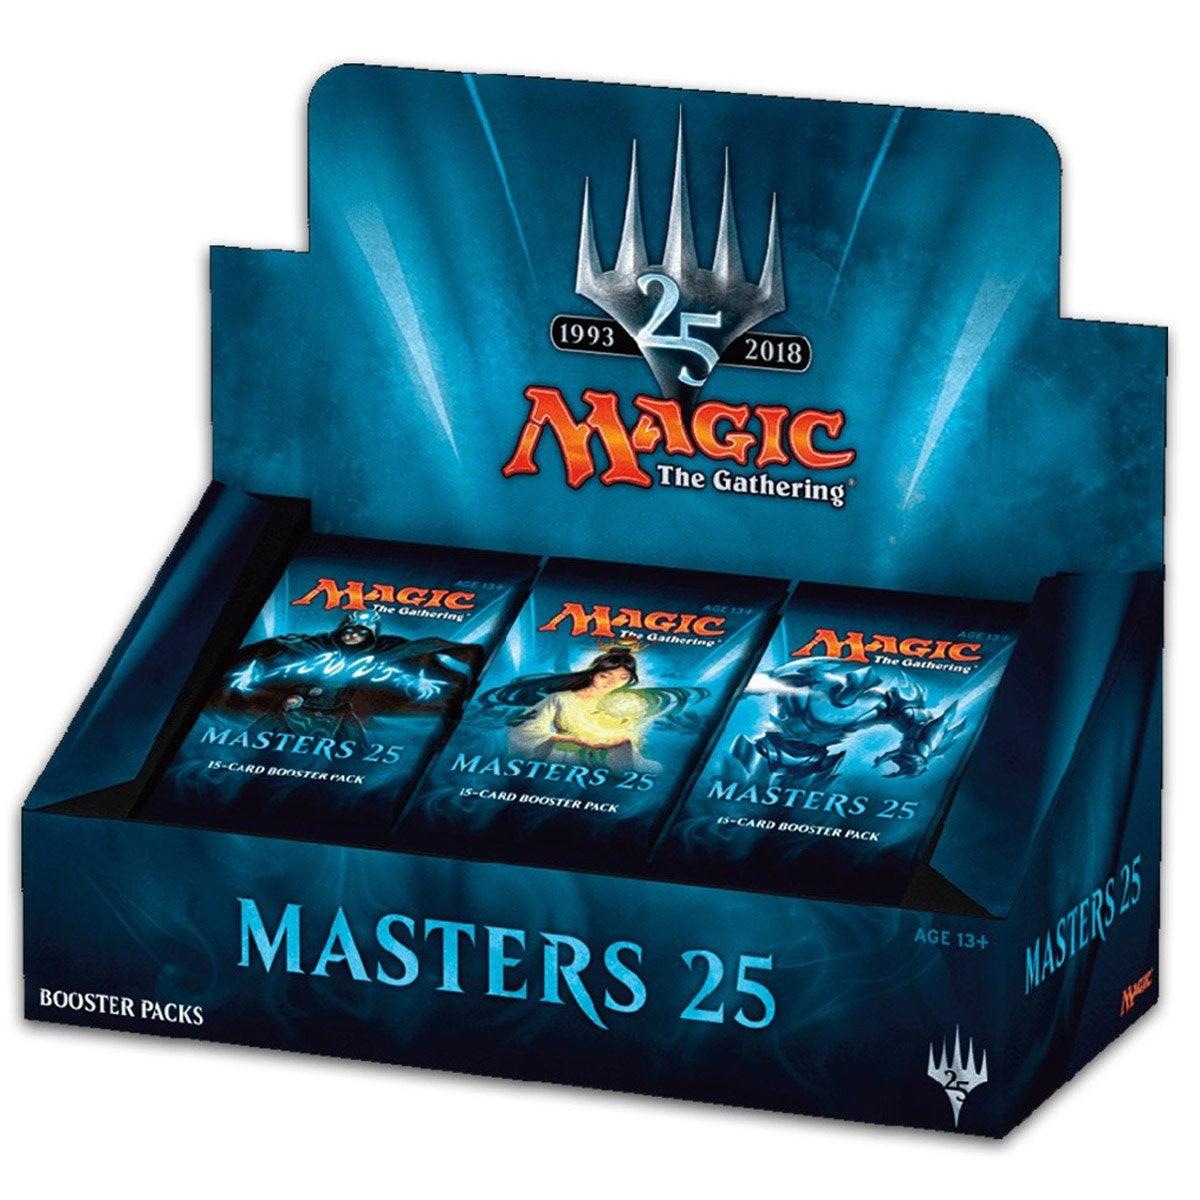 Masters 25 Set Booster Box Magic The Gathering